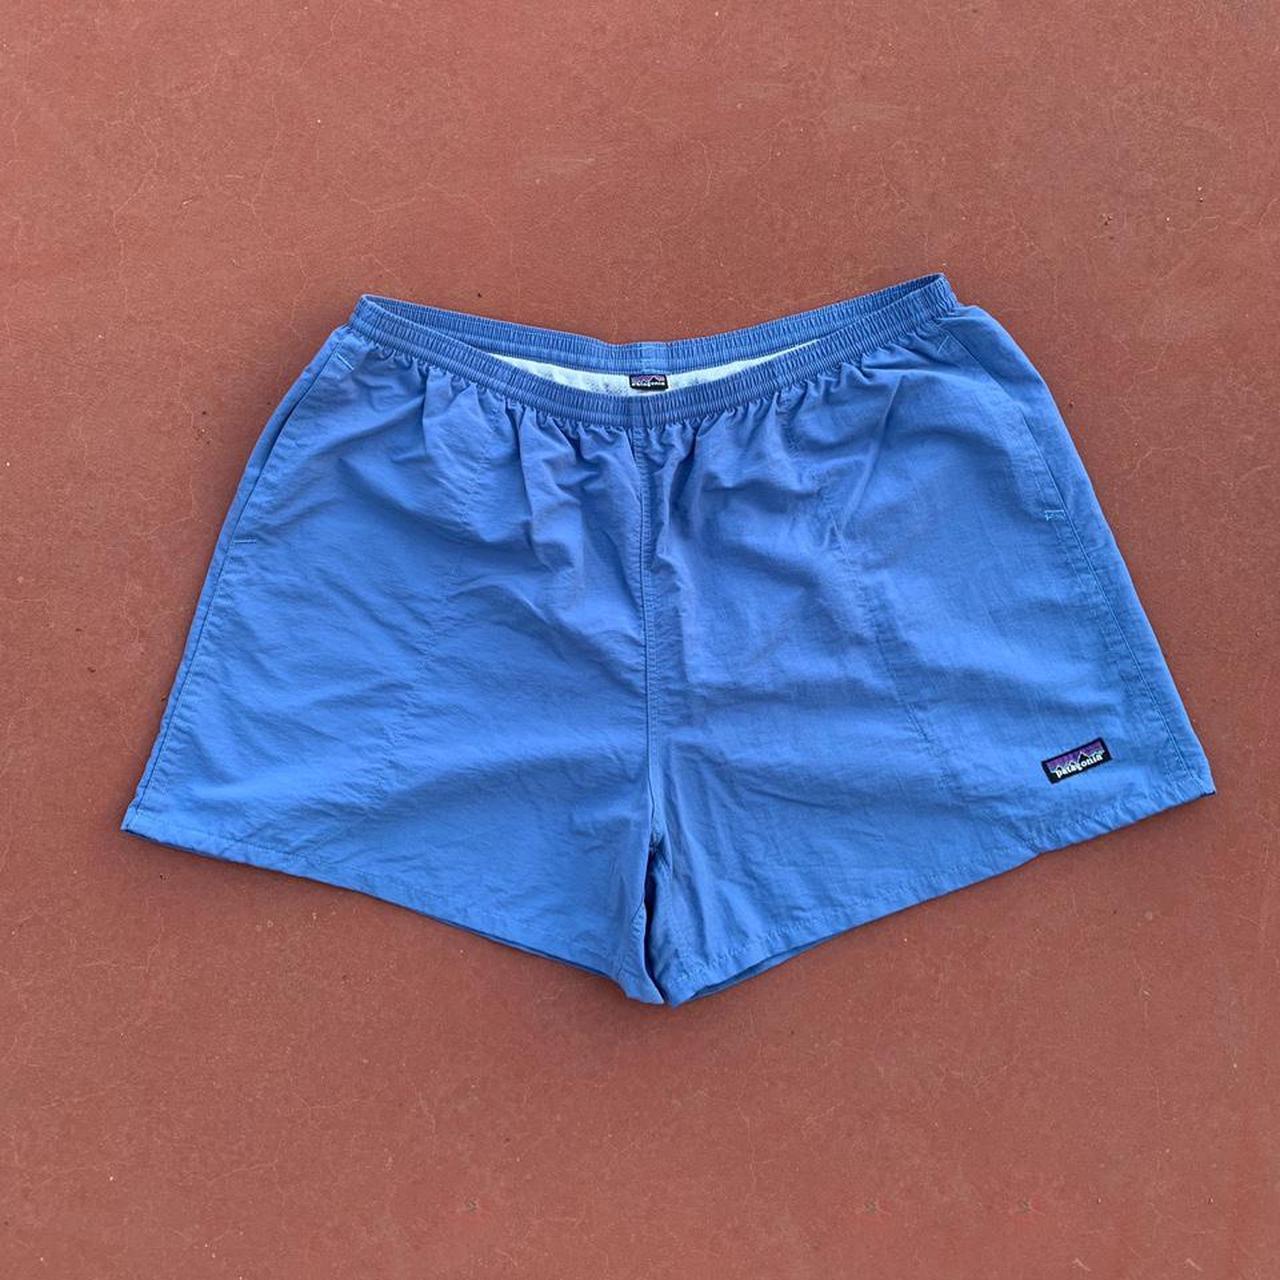 Product Image 1 - Patagonia Baggies Shorts 100% nylon  Elastic